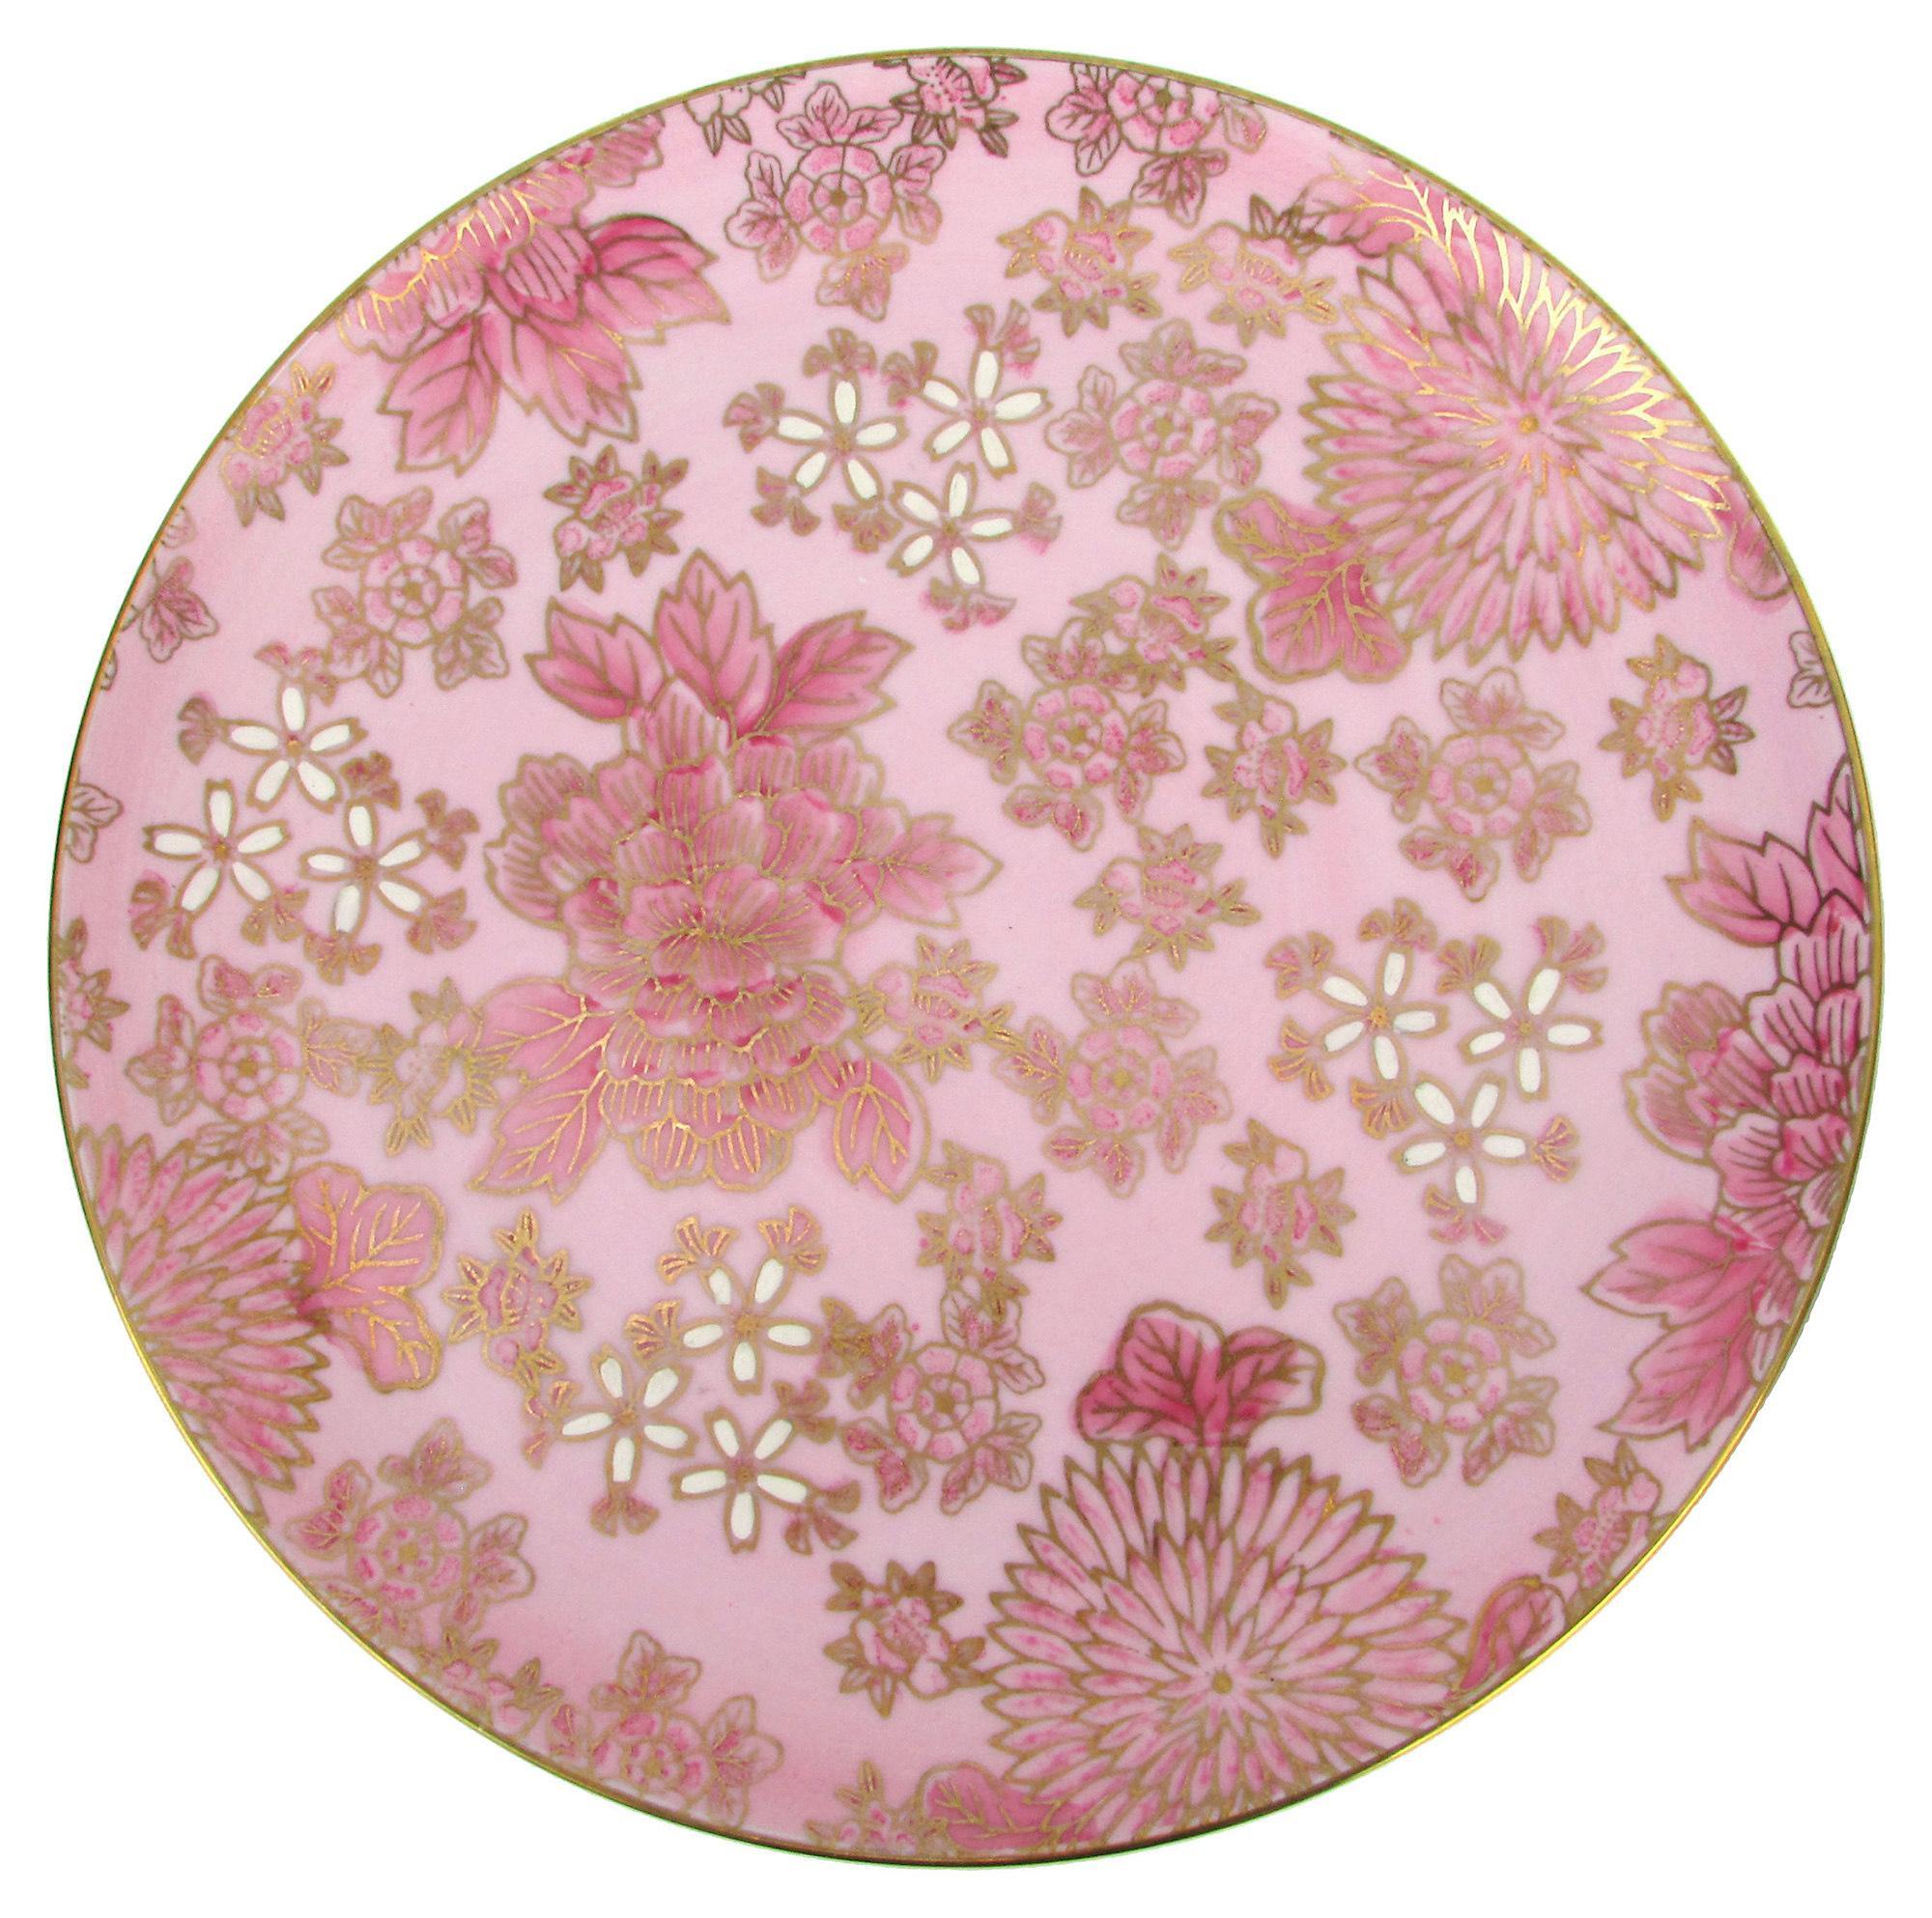 Dorothy Thorpe Pink Floral Dot3 Dinnerware 51-Pcs - Image 3 of 6  sc 1 st  Chairish & Dorothy Thorpe Pink Floral Dot3 Dinnerware 51-Pcs | Chairish